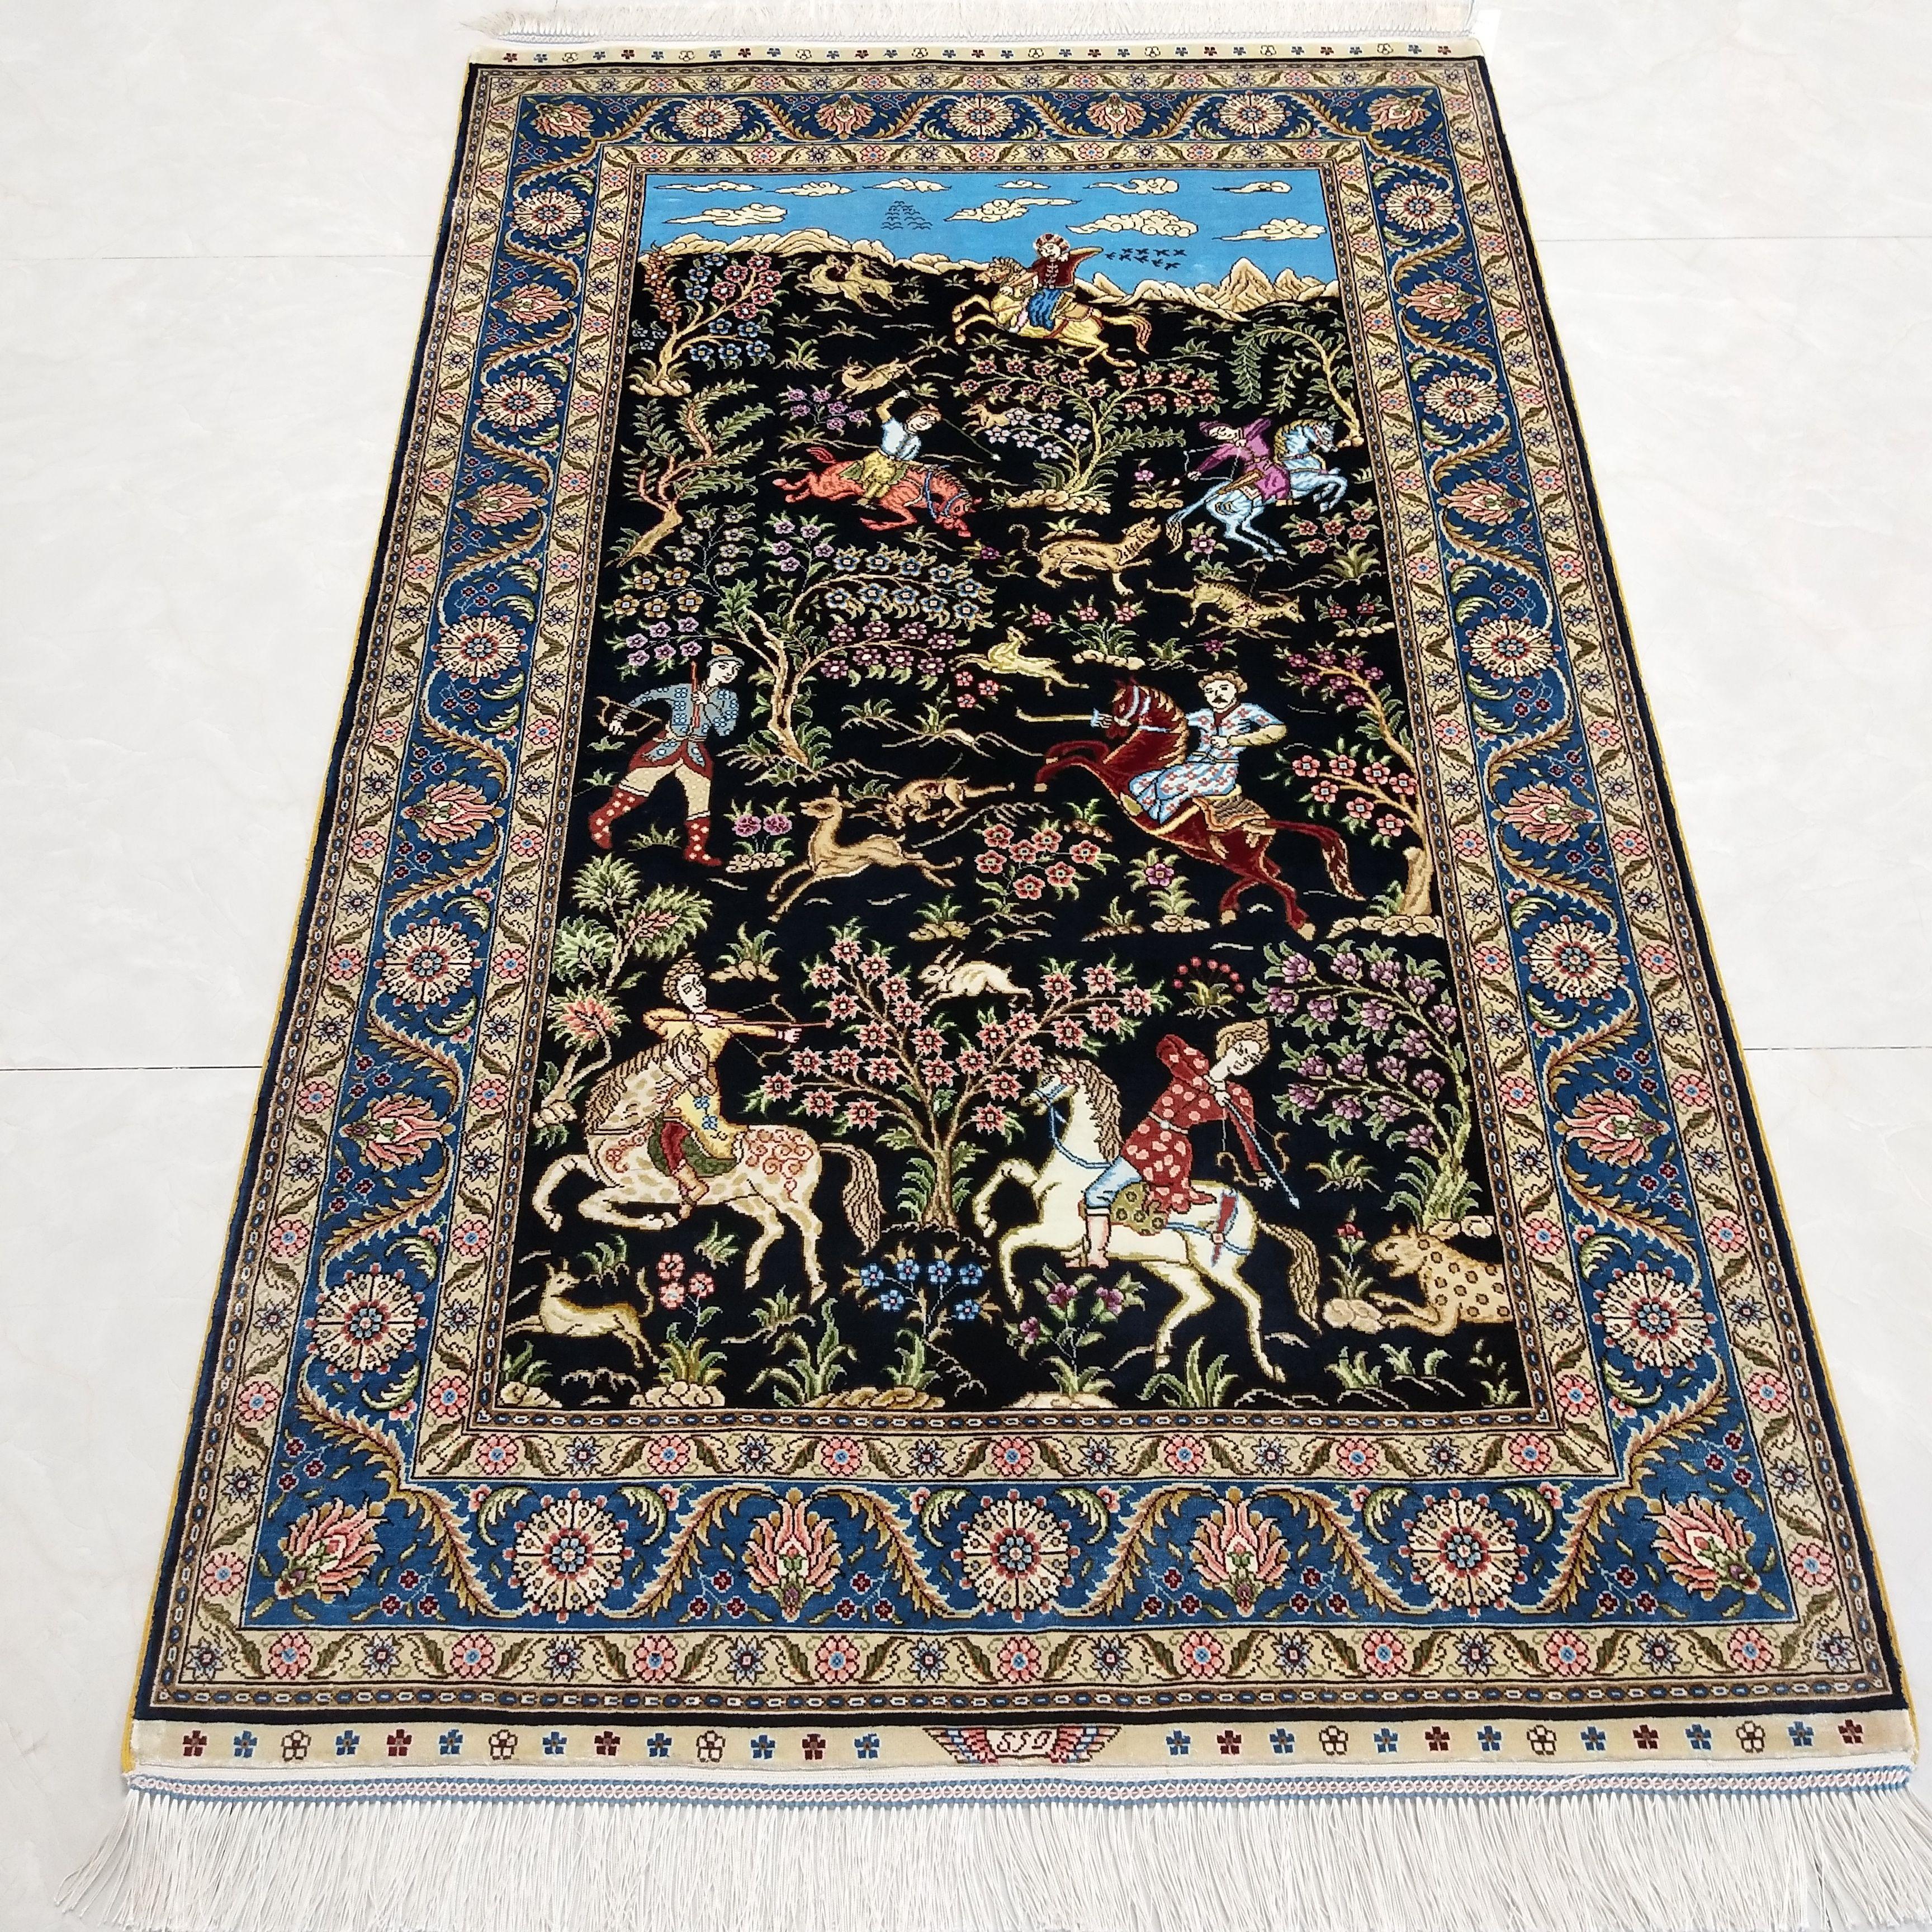 3x5ft handmade silk carpets Whatsapp:+86 185 6718 5850 : 3x5ft handmade silk carpets Whatsapp:+86 185 6718 5850   carpets handmade silk   silk carpets handmade #carpets #handmaderugs #orientalcarpets #homedecoration #persiancarpet #silkcarpetsfactory #prayerrugs #persianrug #turkishcarpet #tabrizdesigns #turkishdesigns #kermandesign #silkcarpets #handknotted #3x5ft #handmade #silk